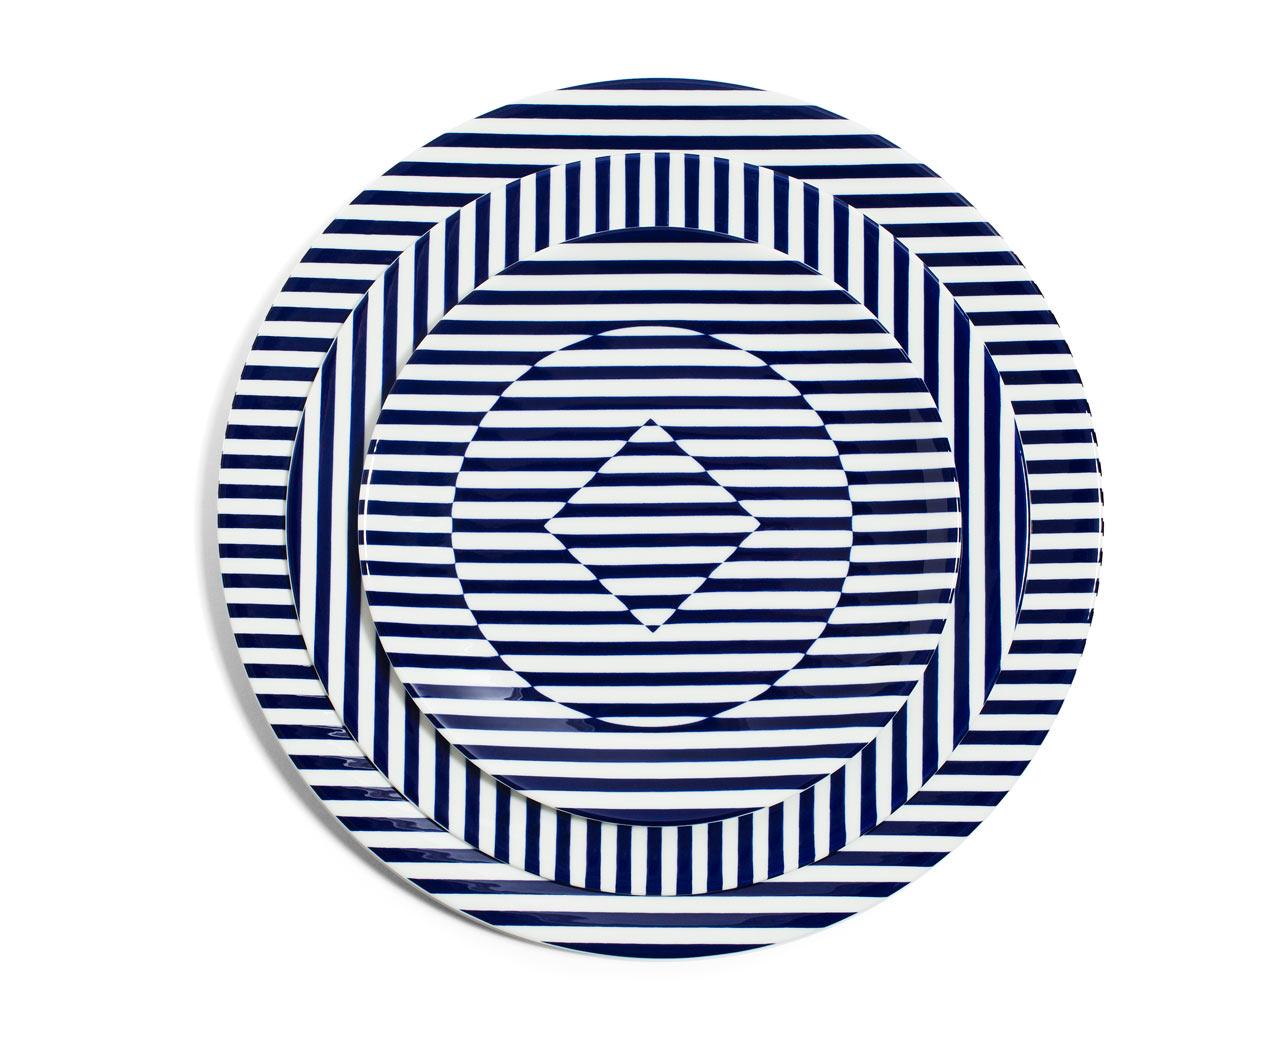 Patternity-Richard-Brendon-3-Reason-all-plates